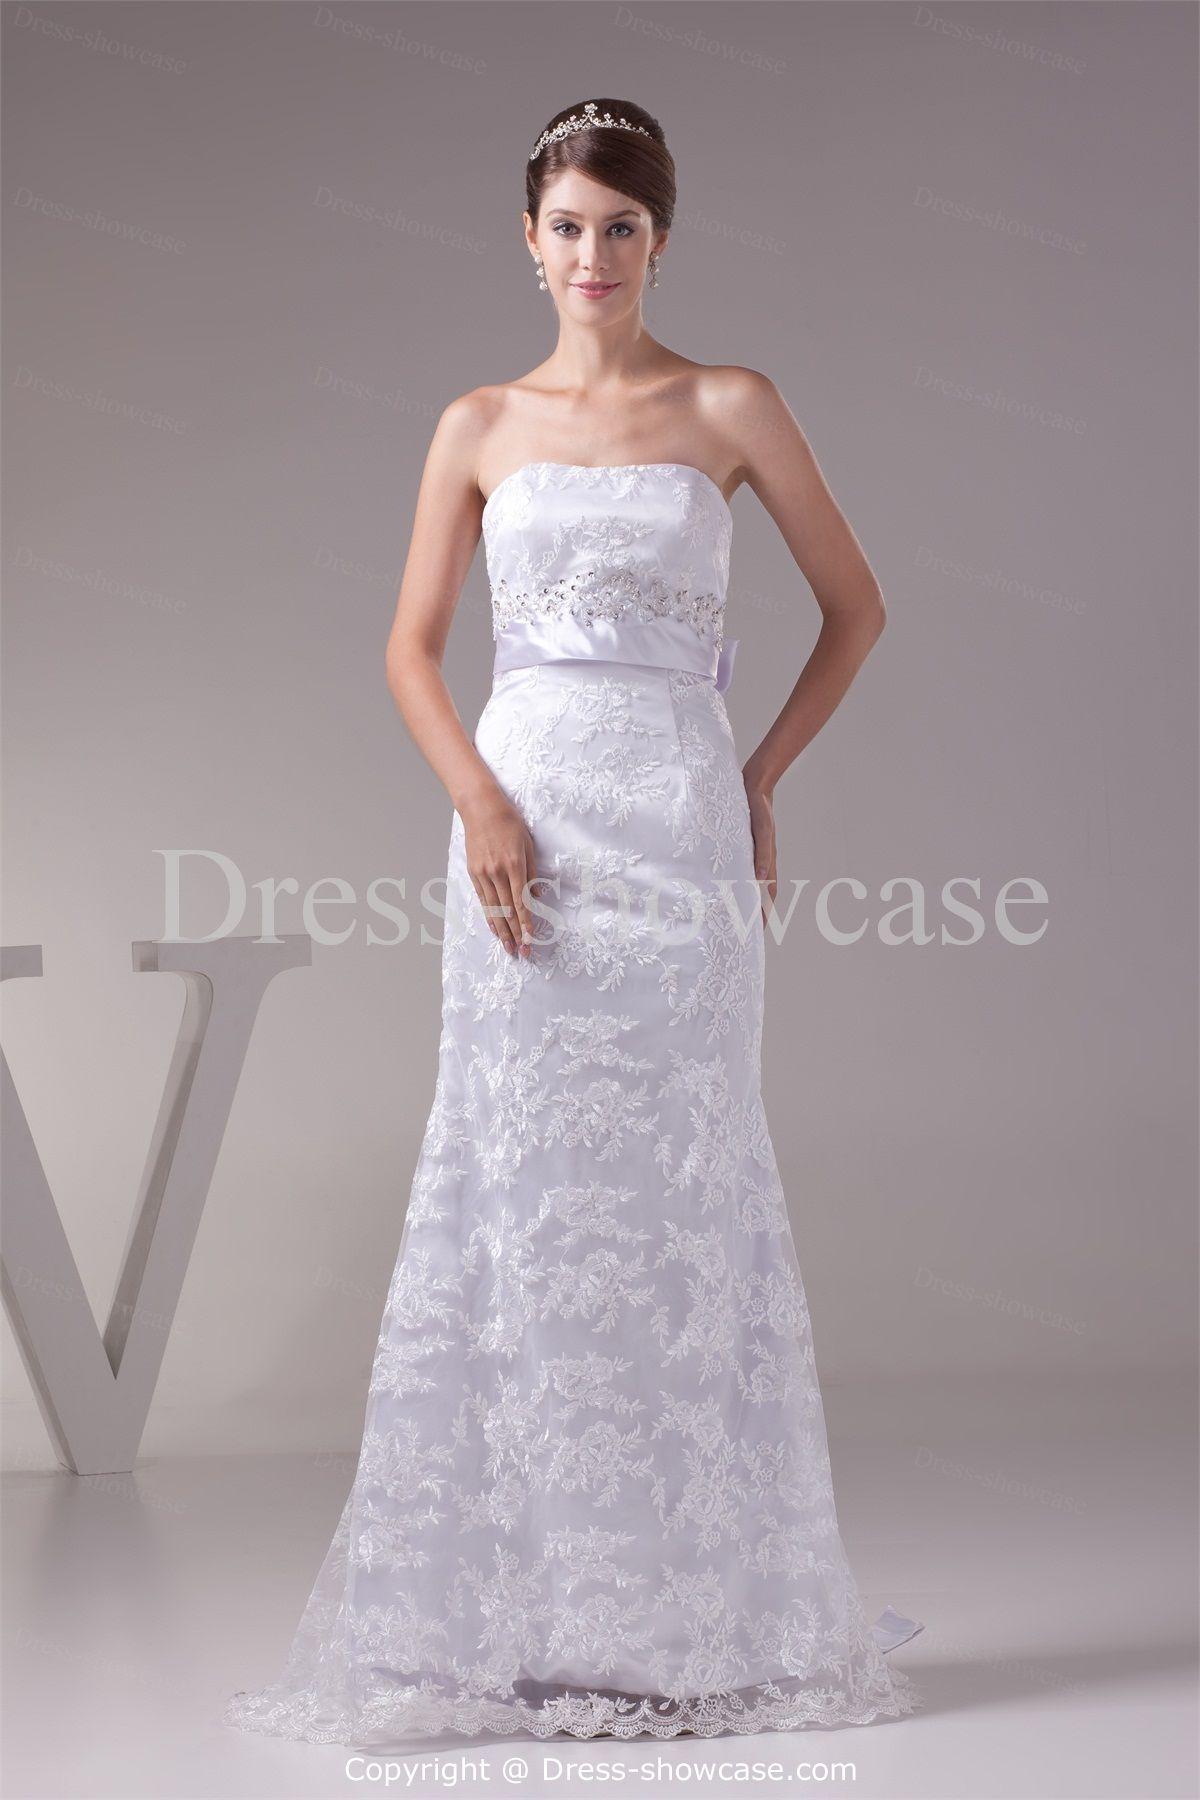 Corset-back Beading Beach/ Destination Wedding Dress -Wedding Dresses